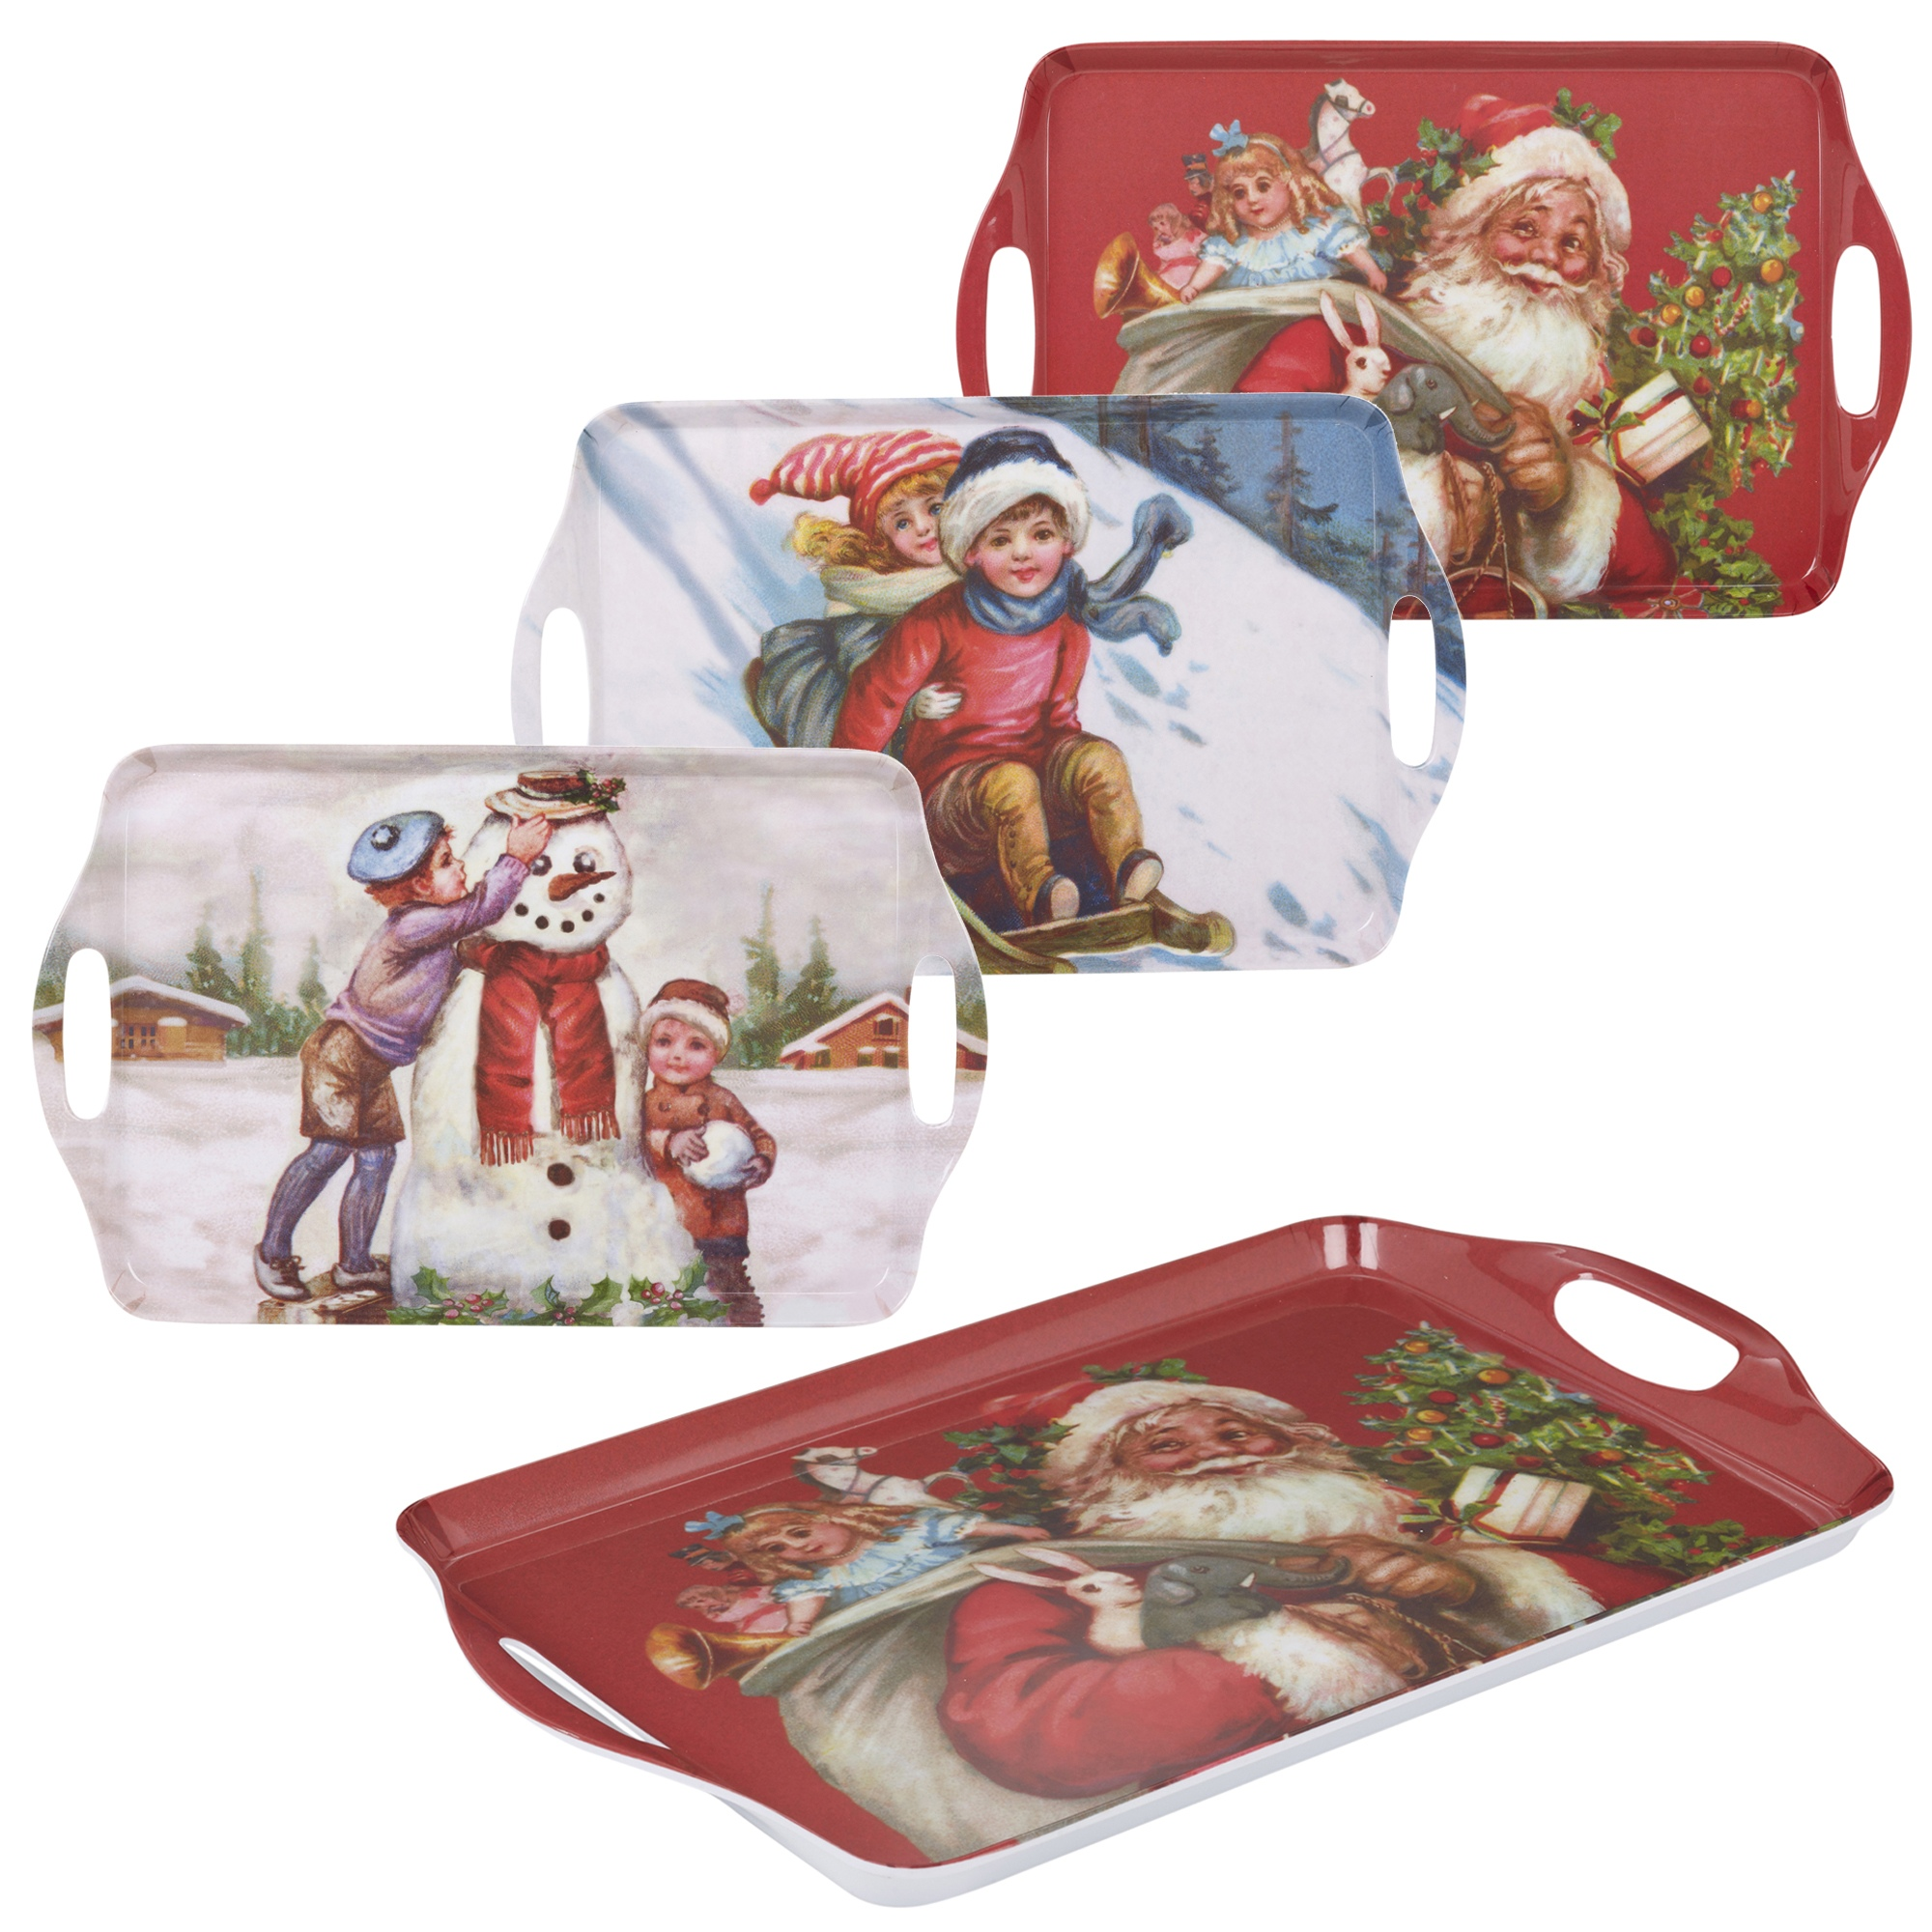 Melamine Christmas Platters.Details About Melamine Christmas Food Serving Tray Festive Holiday Platter Tableware Dinner